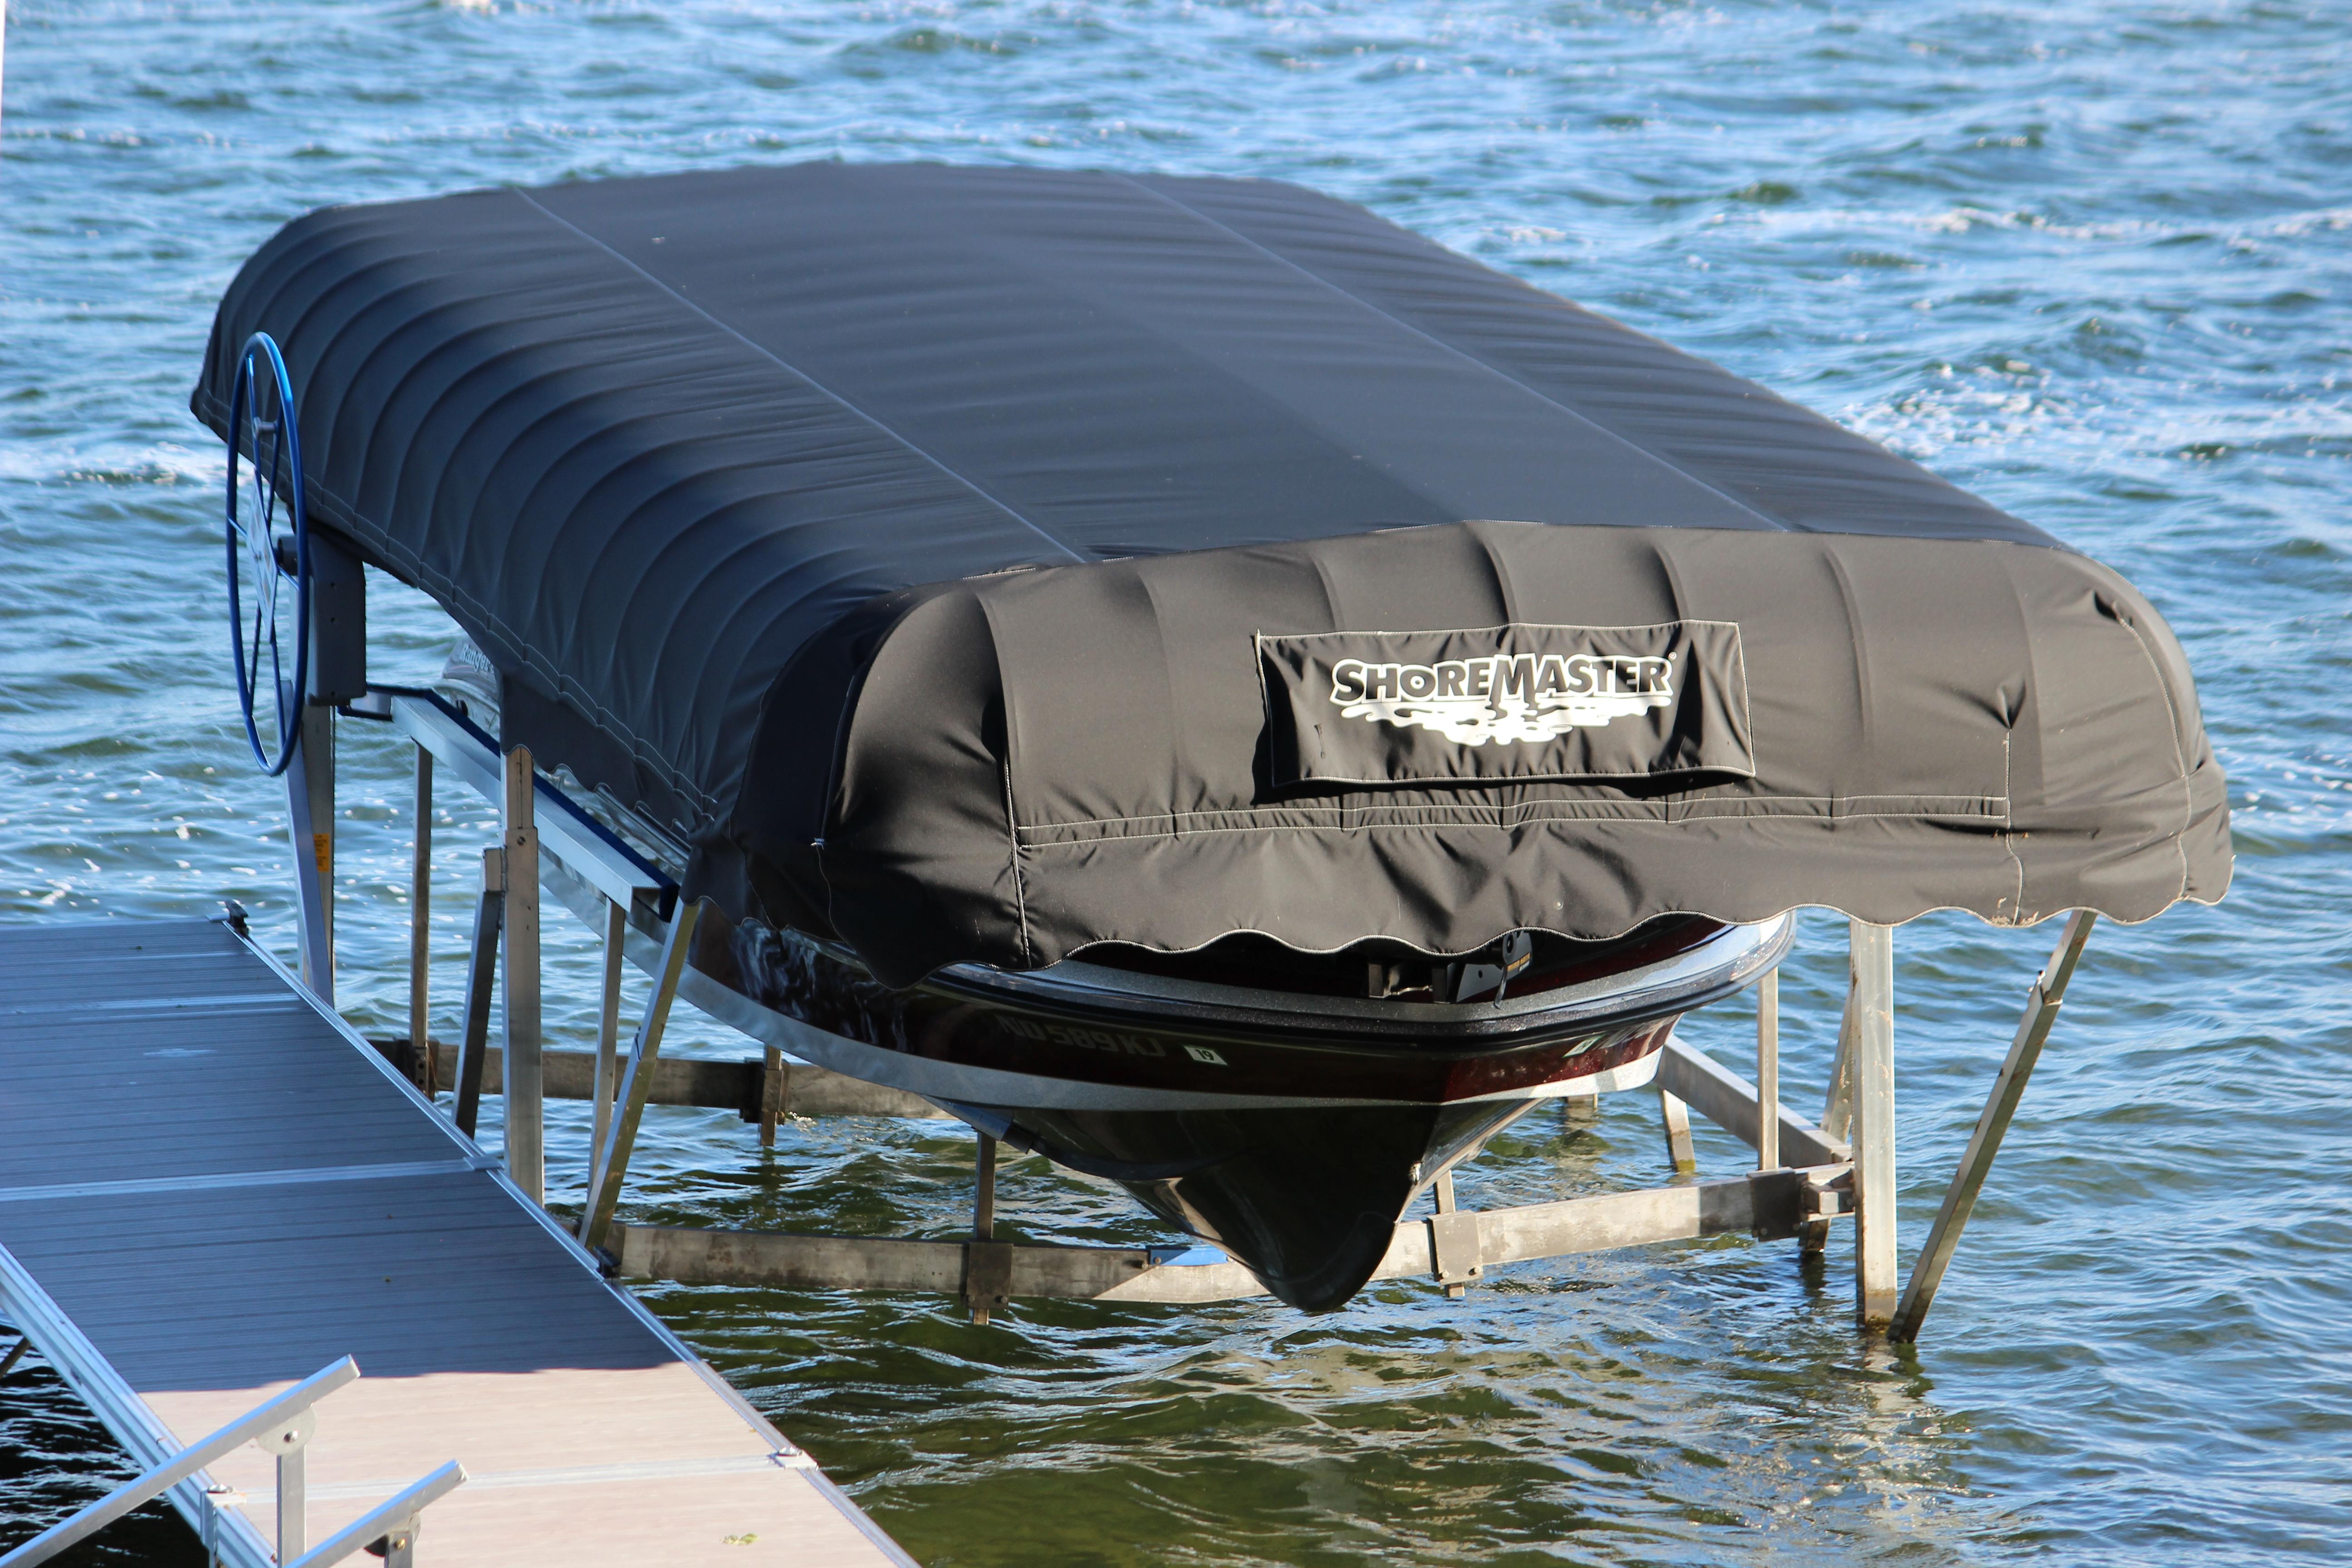 Boat Lift Canopy Systems | ShoreMaster